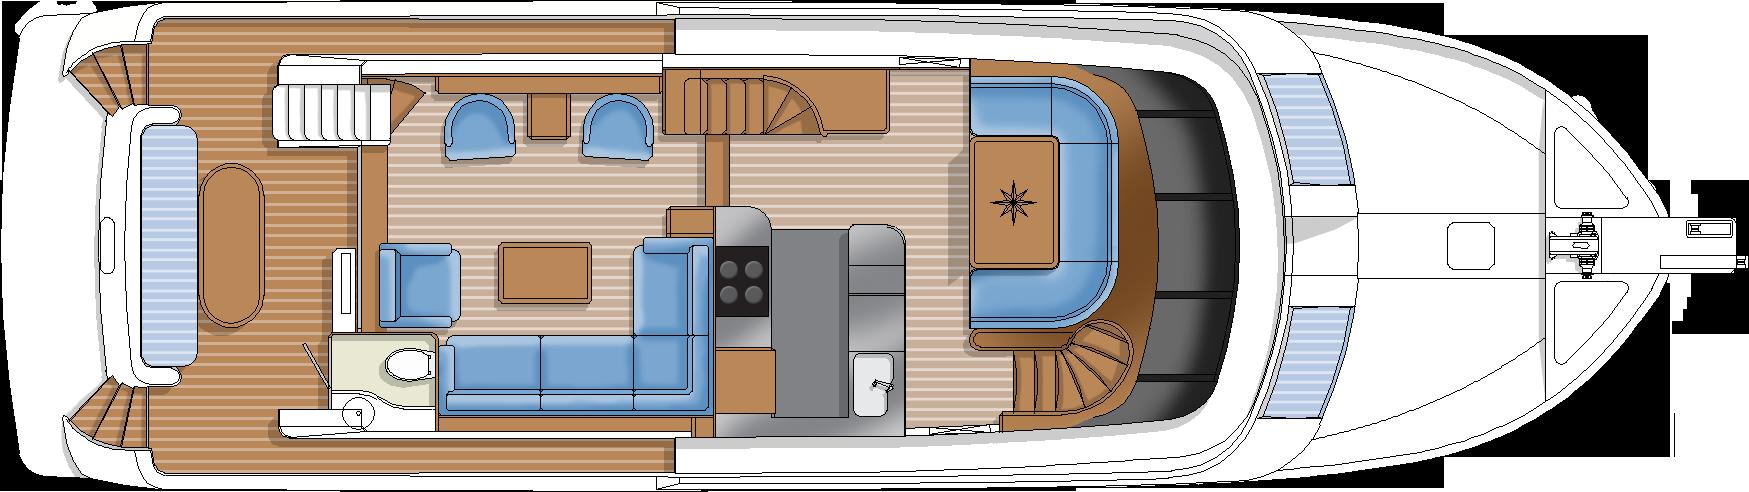 hampton yachts main deck